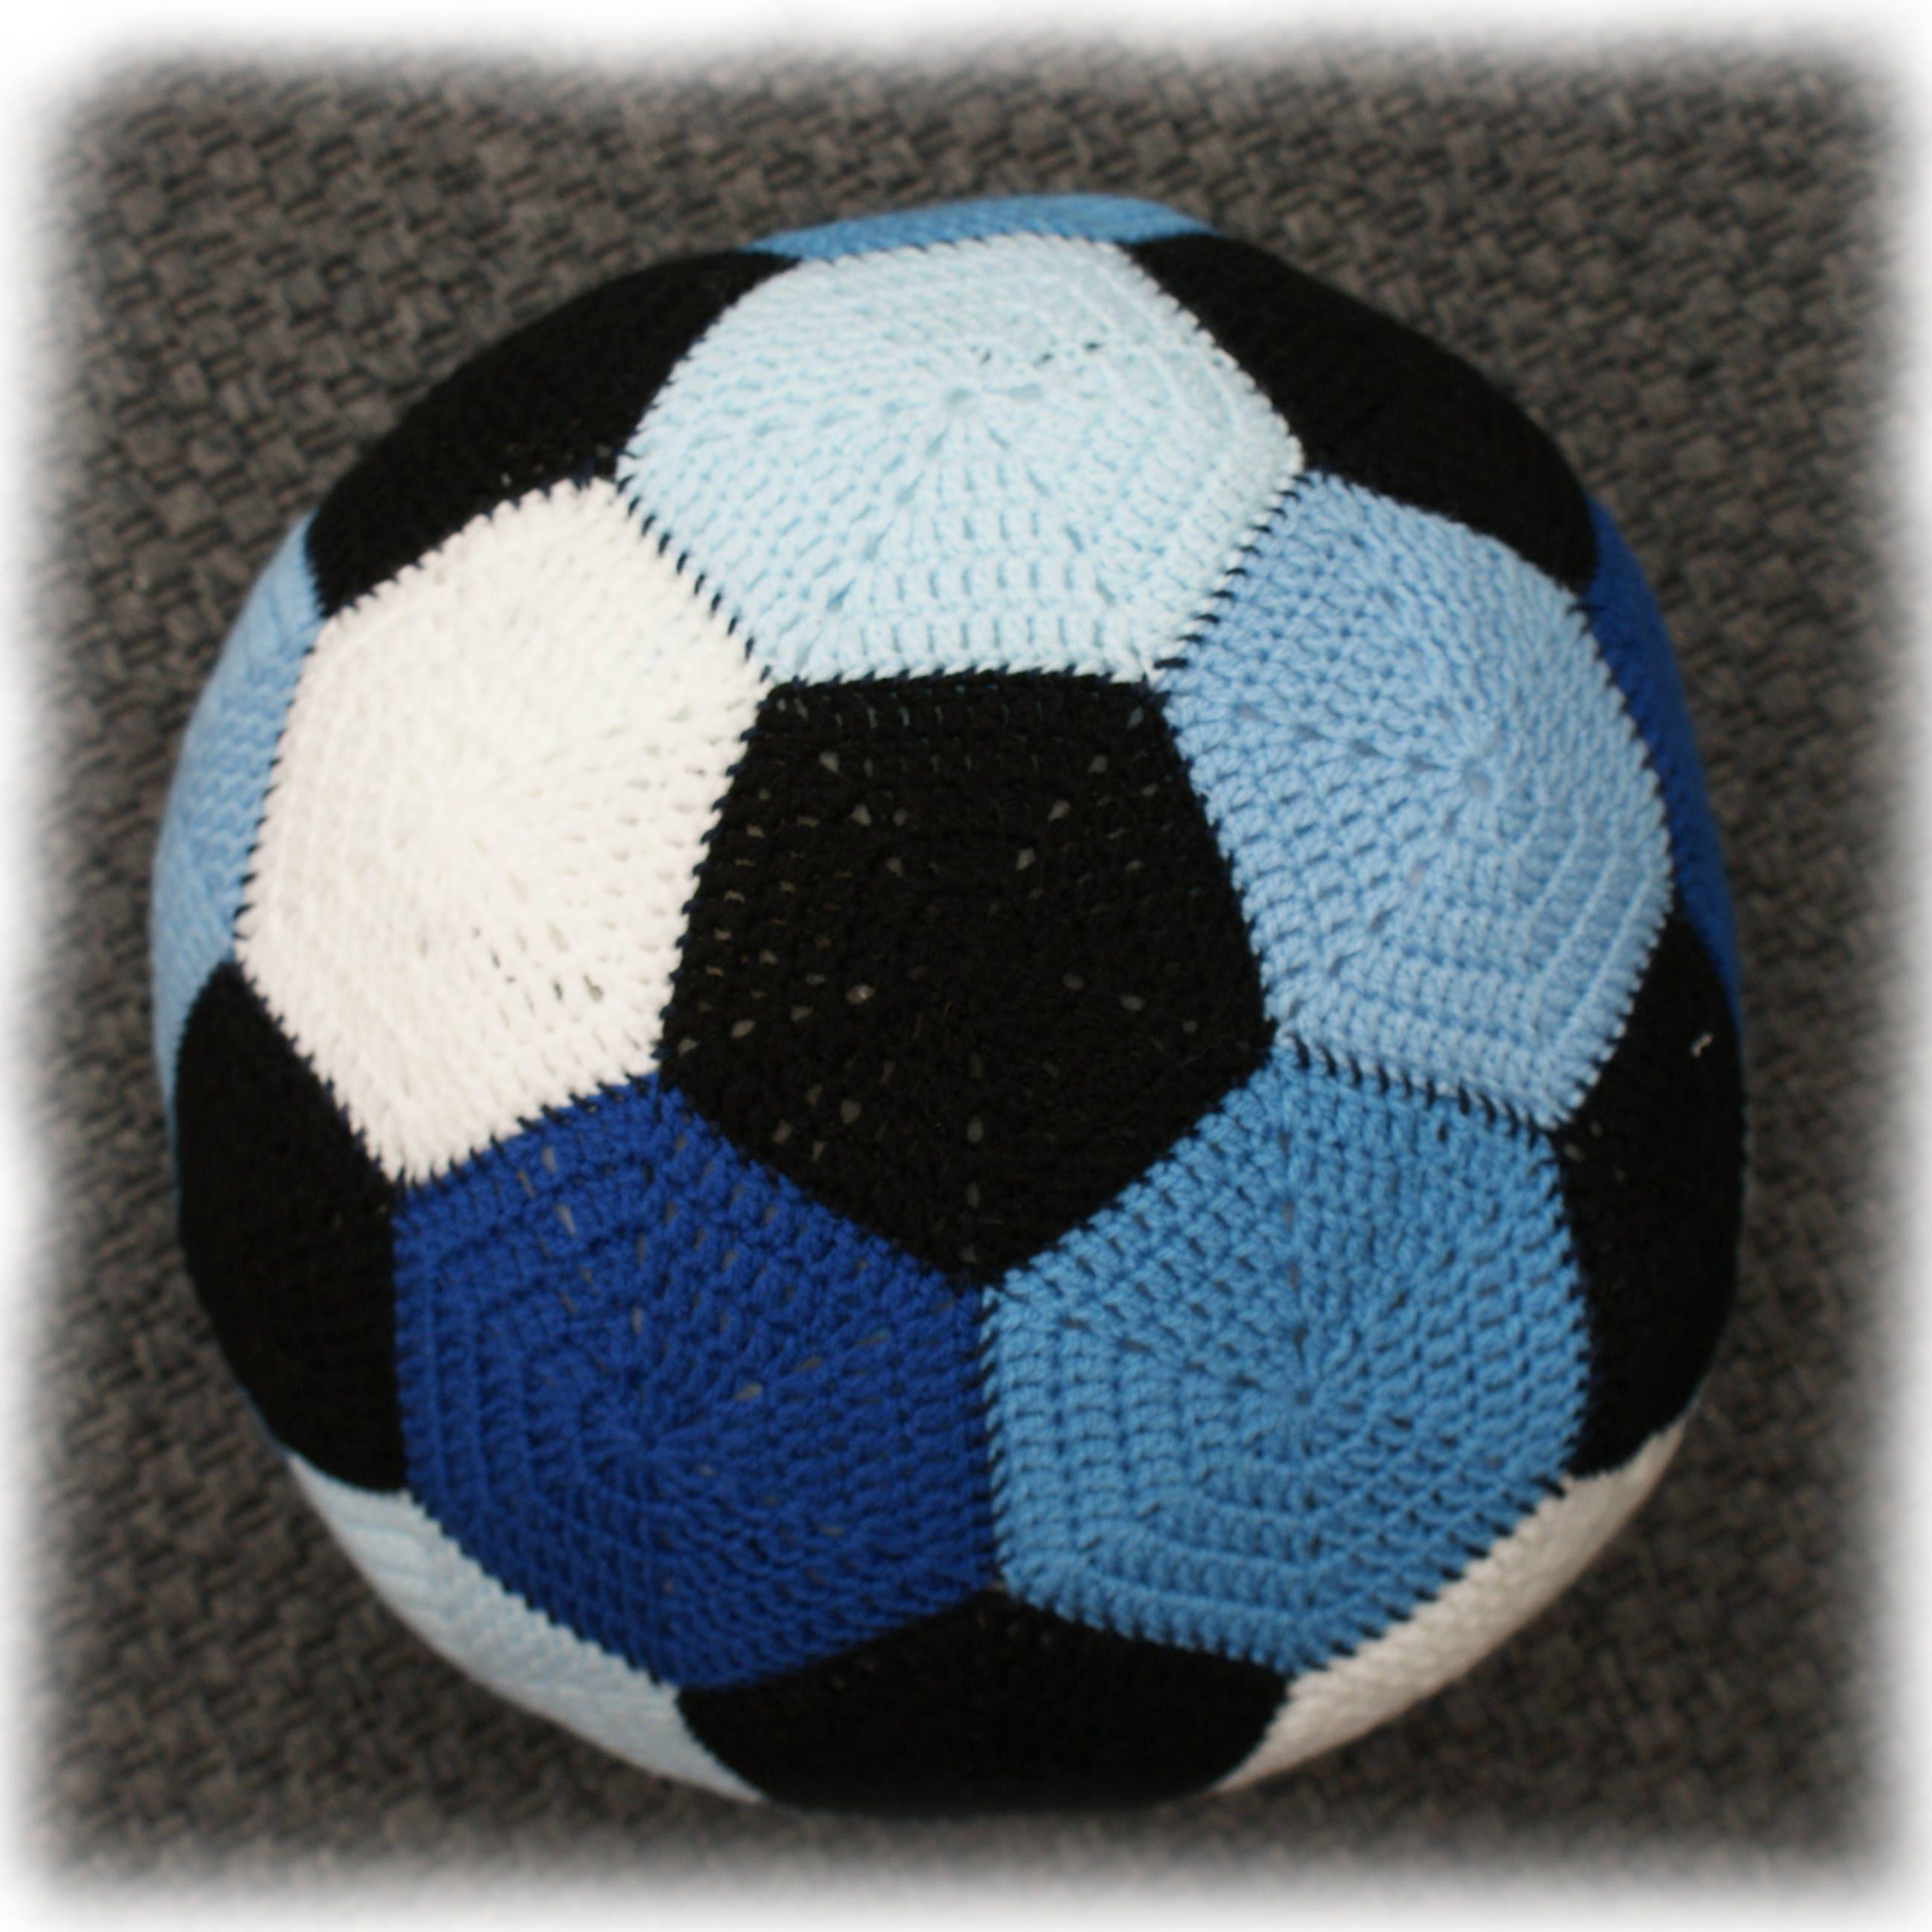 Fine Soccer Ball Crochet Pattern Image - Sewing Pattern for Wedding ...